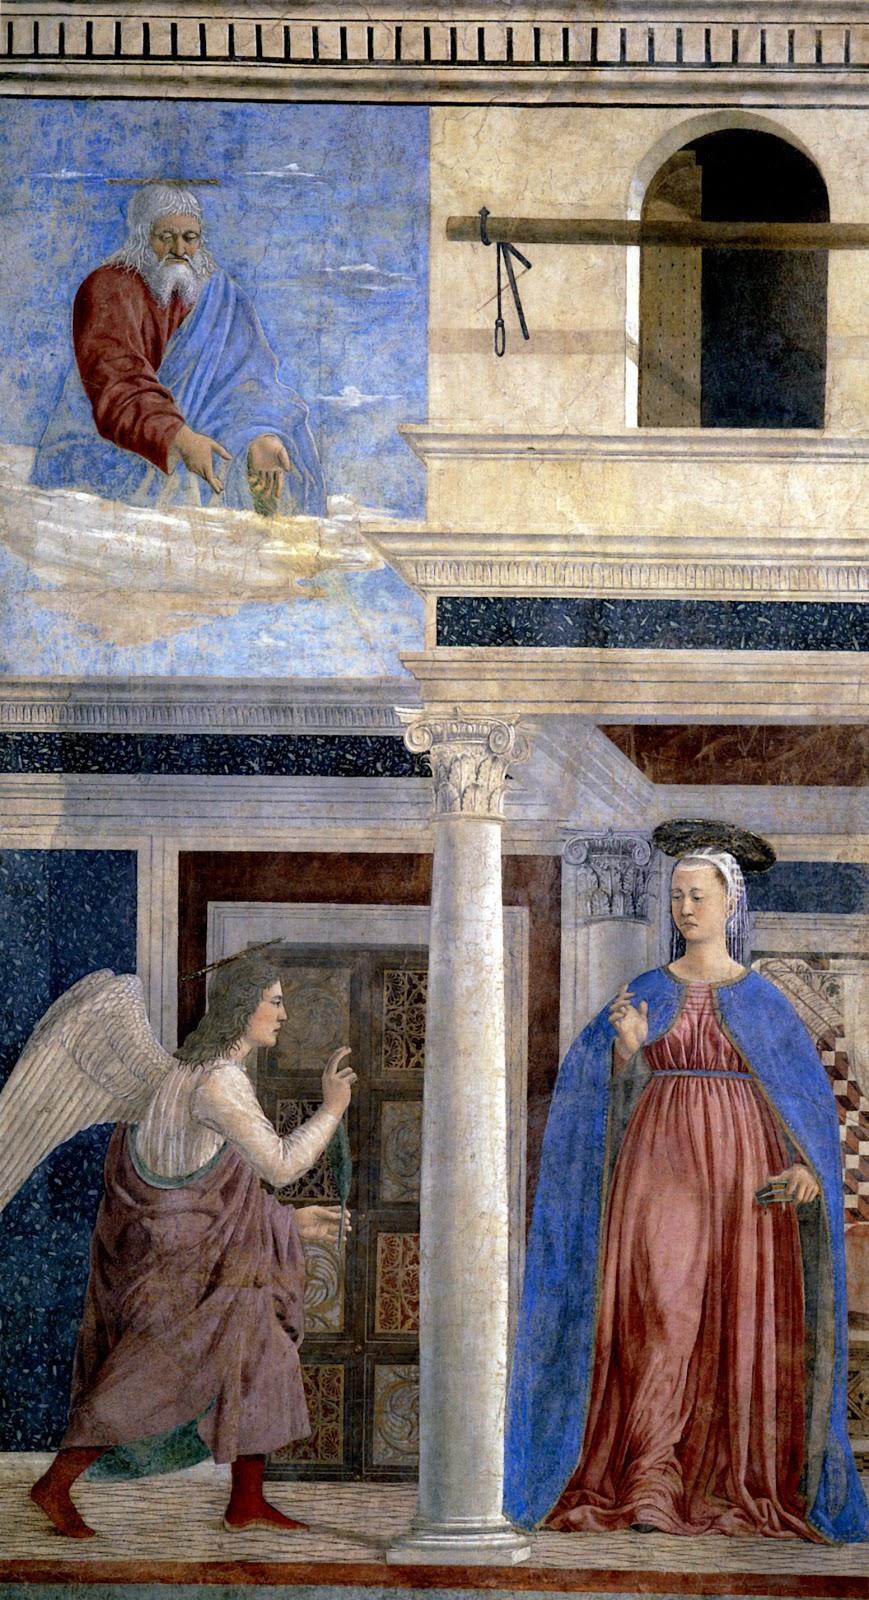 Piero  della  Francesca  The  History  of  the  True  Cross        Annunciation